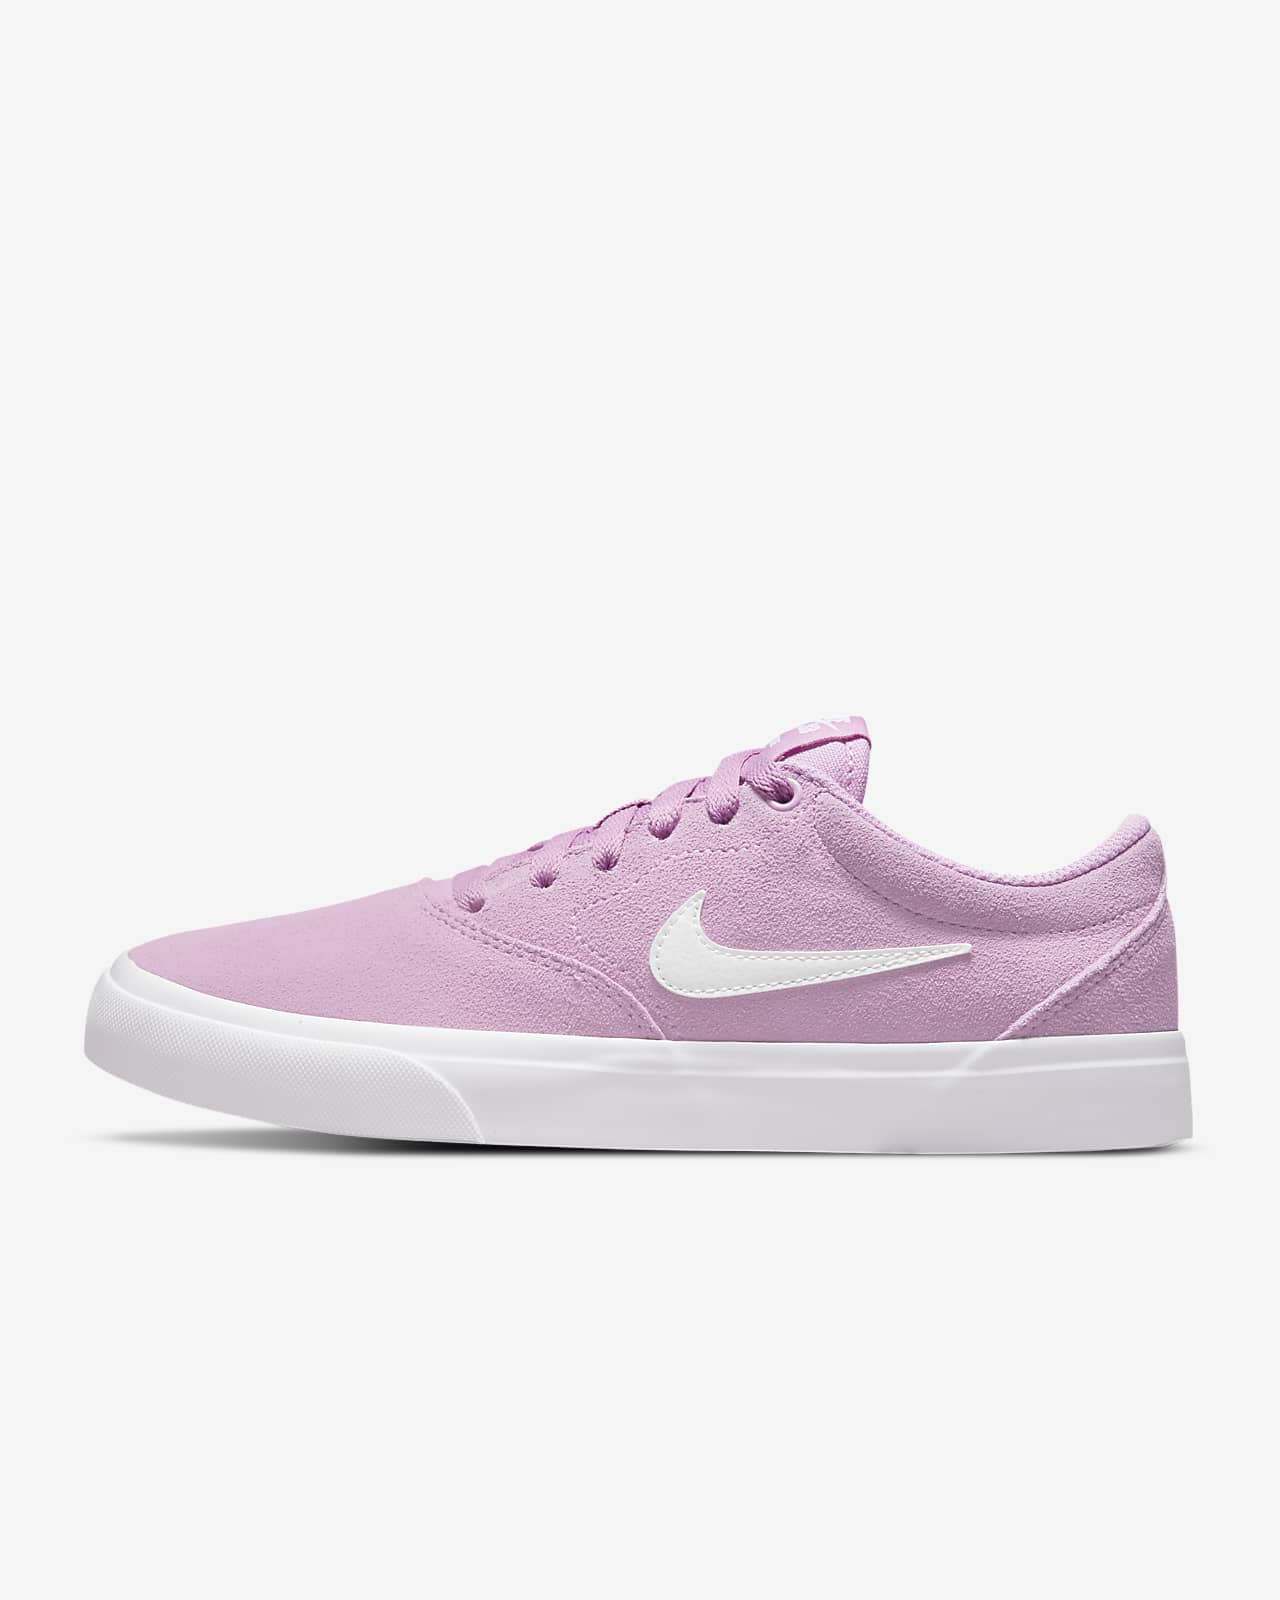 Nike SB Charge Suede Damen-Skateboardschuh